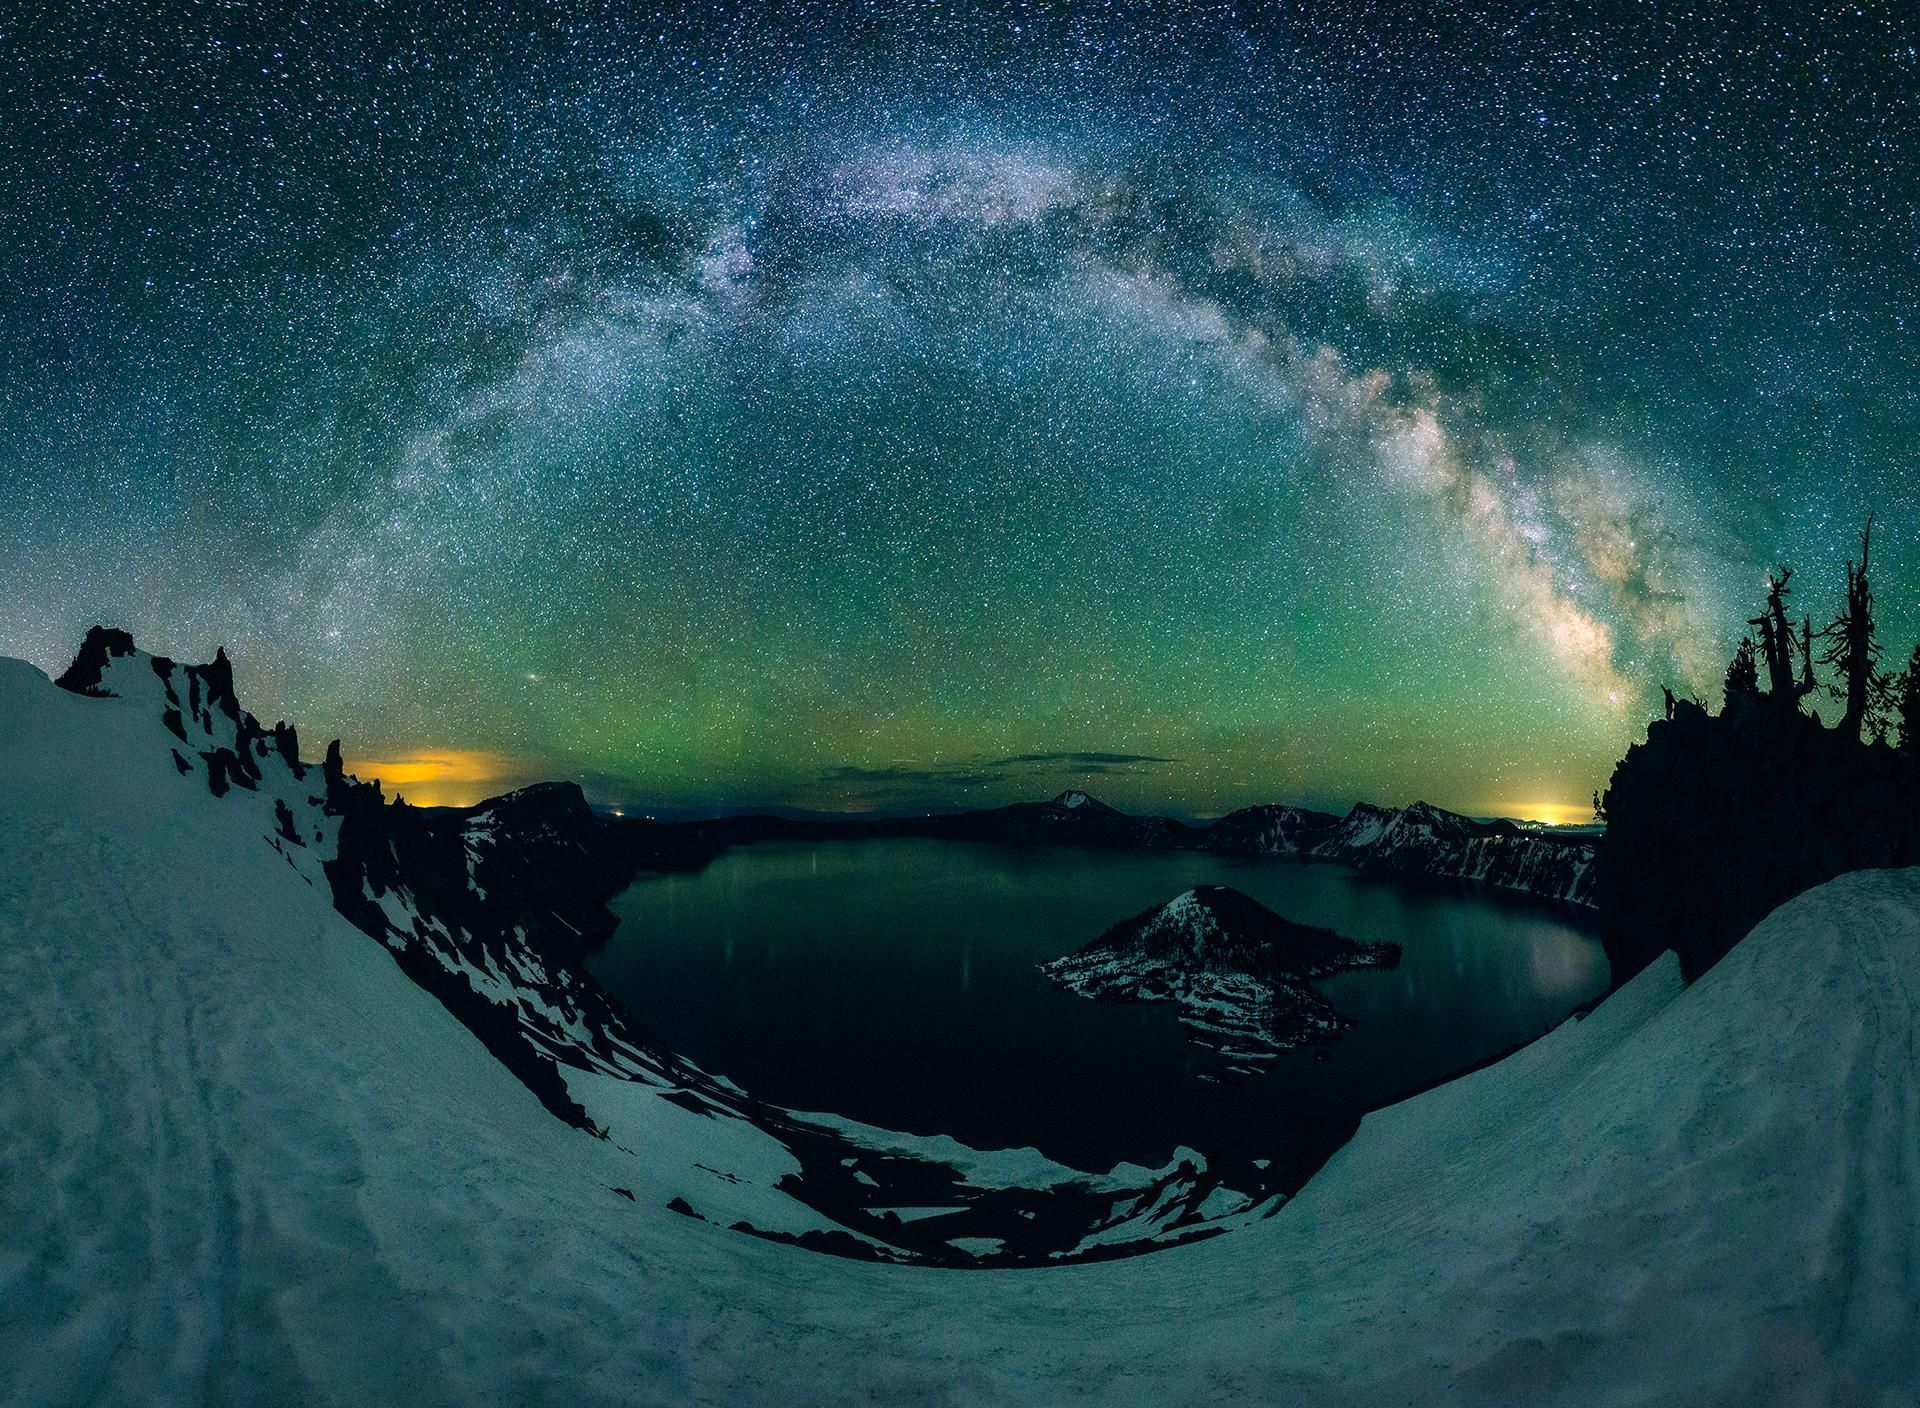 Northern Hemisphere Milky Way - Crater Lake Oregon [OC] #craterlakeoregon Northern Hemisphere Milky Way - Crater Lake Oregon [OC] #craterlakeoregon